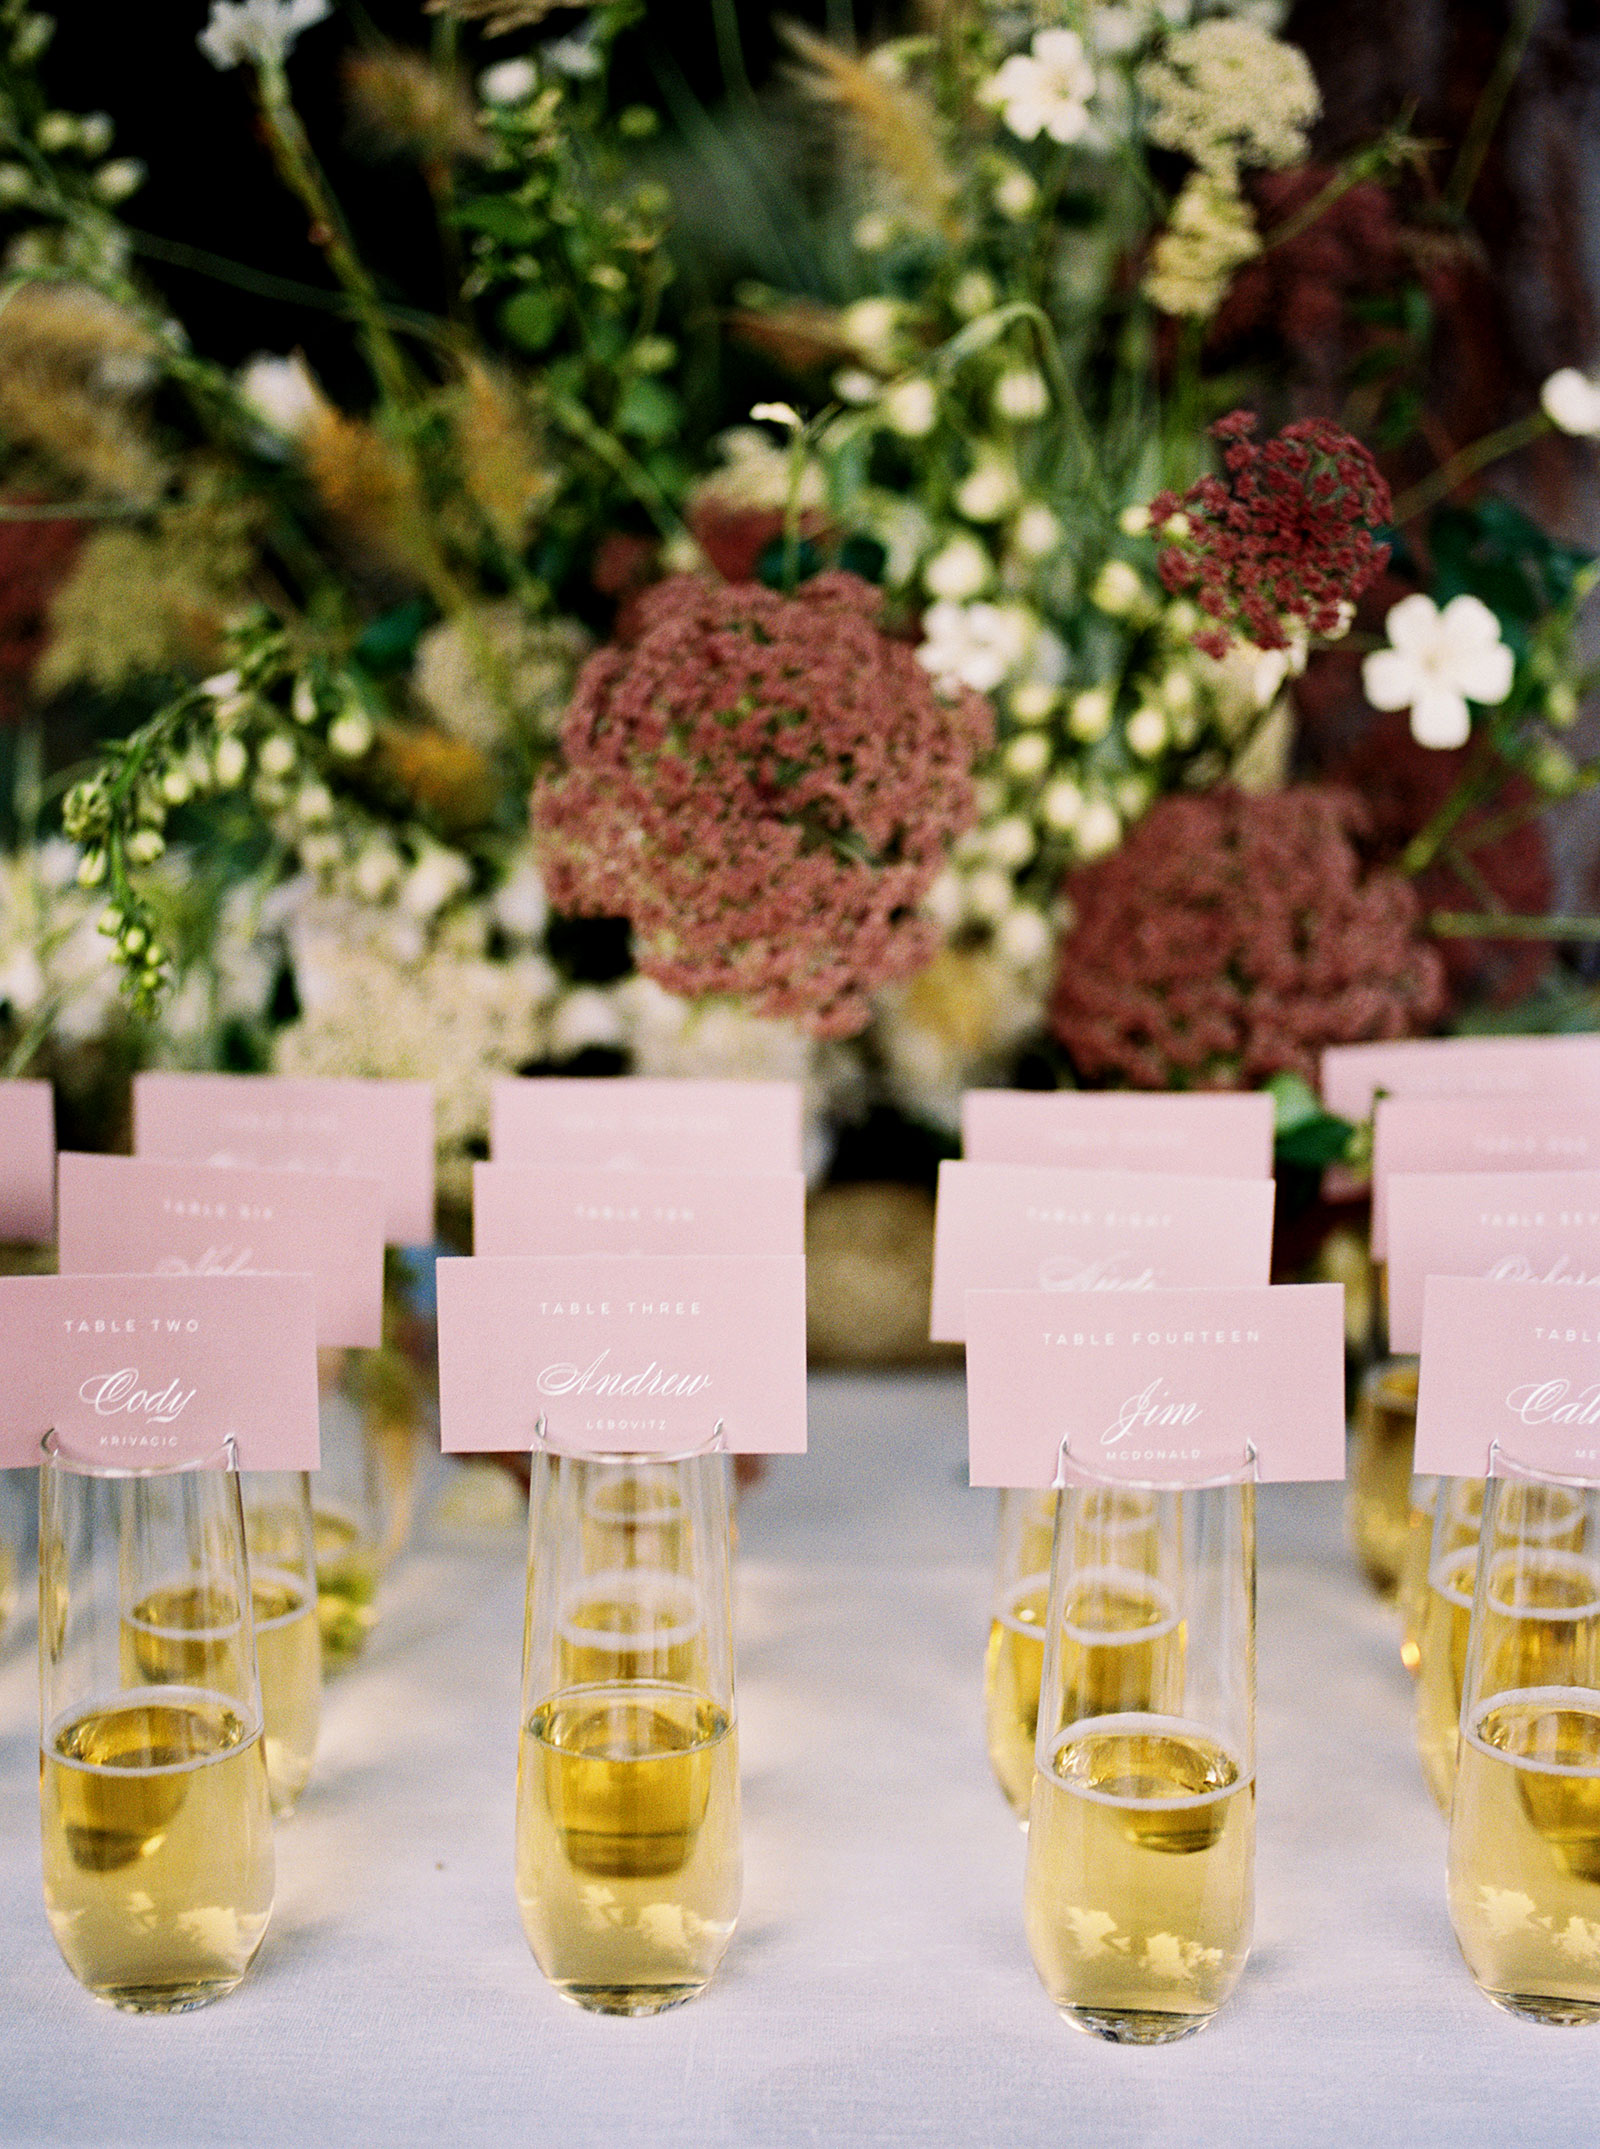 Calistoga-Ranch-Wedding-Cocktail-Table